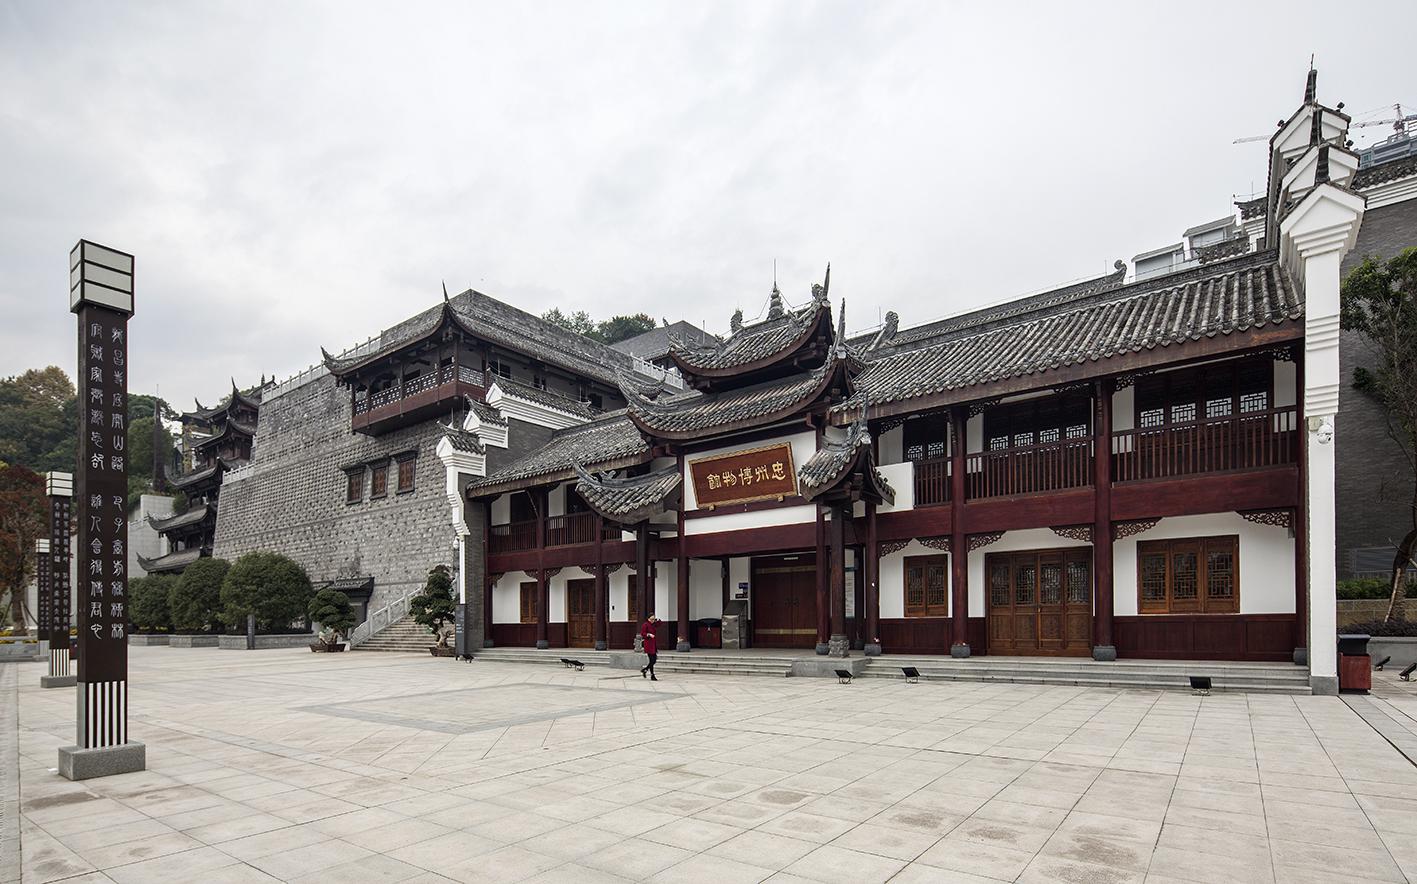 忠州博物馆